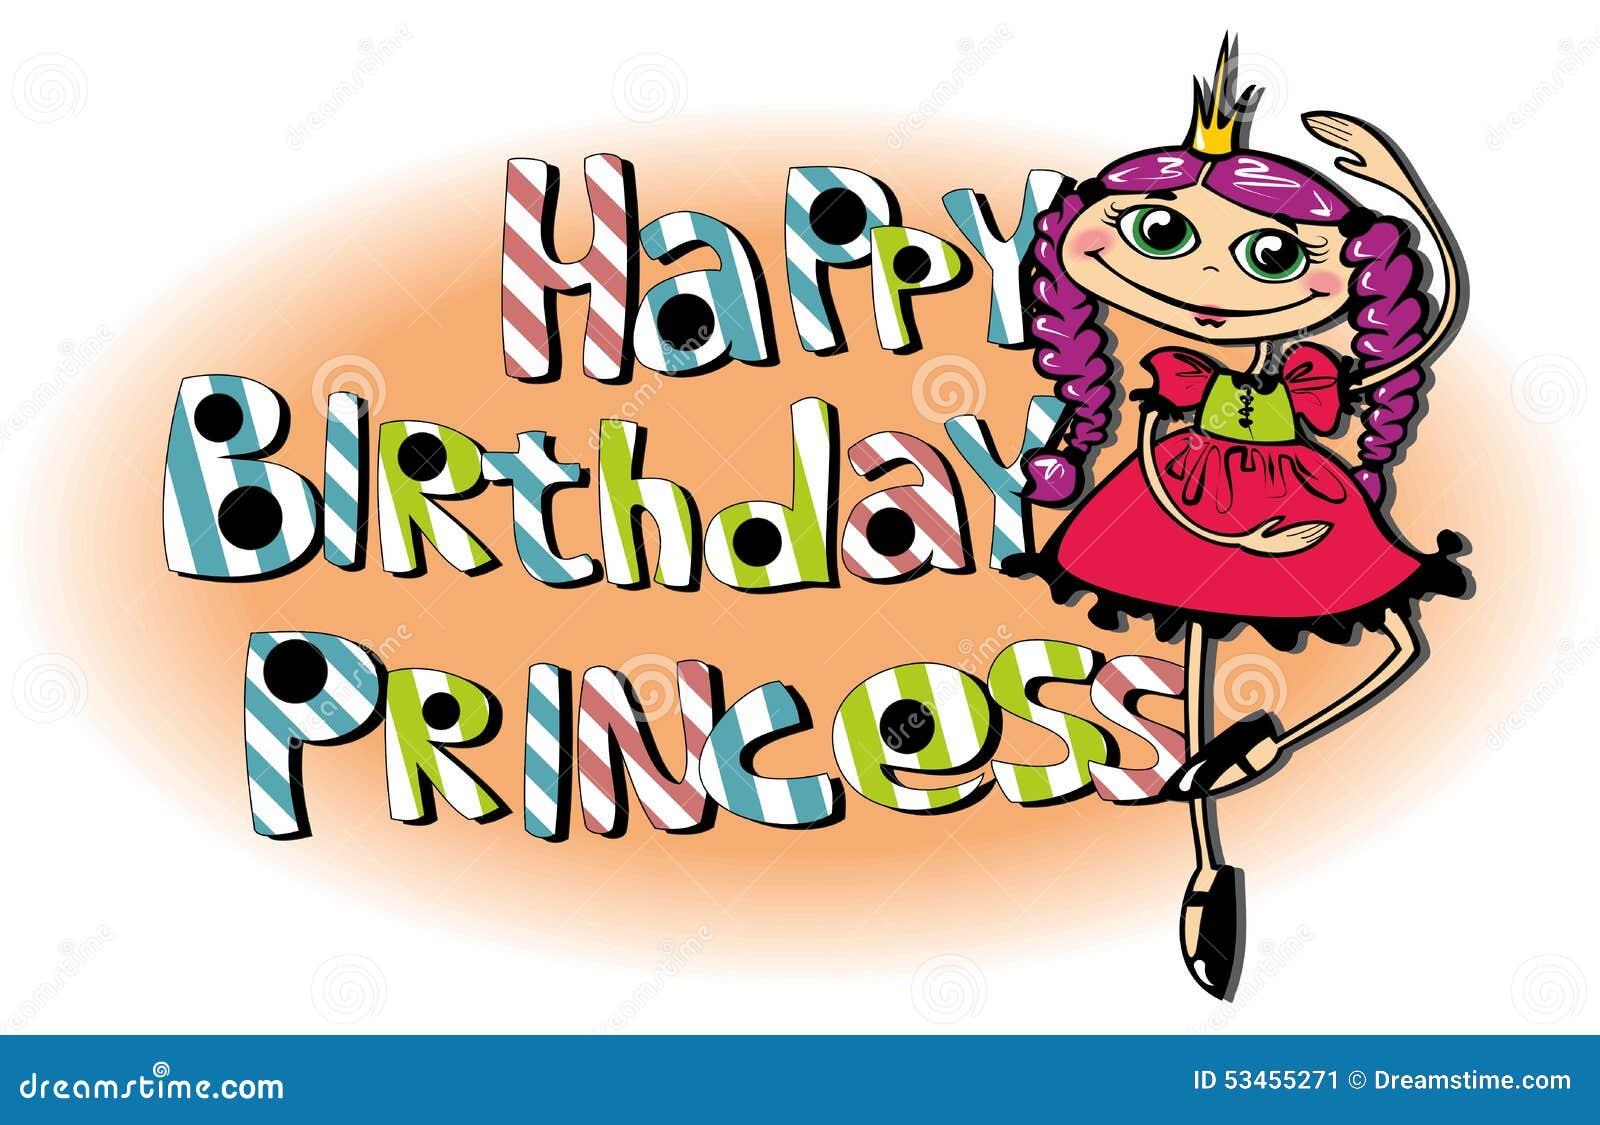 happy birthday princess stock illustration illustration of bright